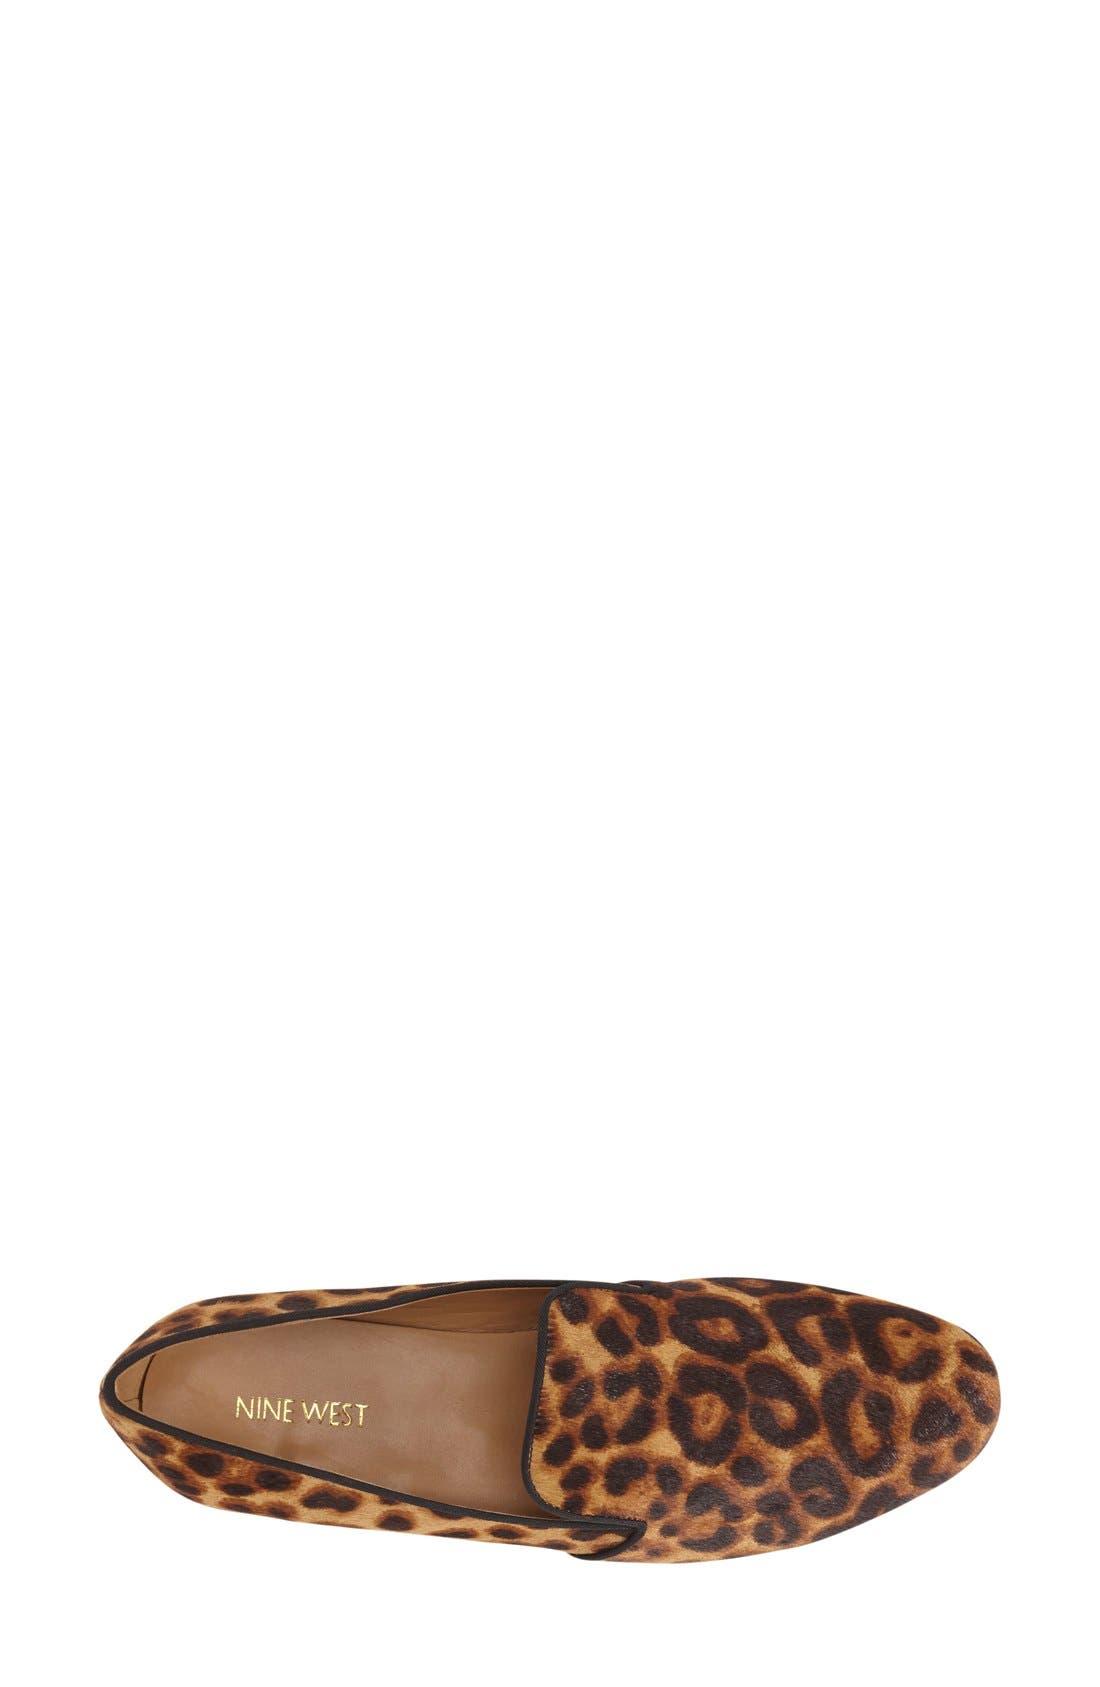 Alternate Image 3  - Nine West 'Clowd'RoundToe Loafer (Women)